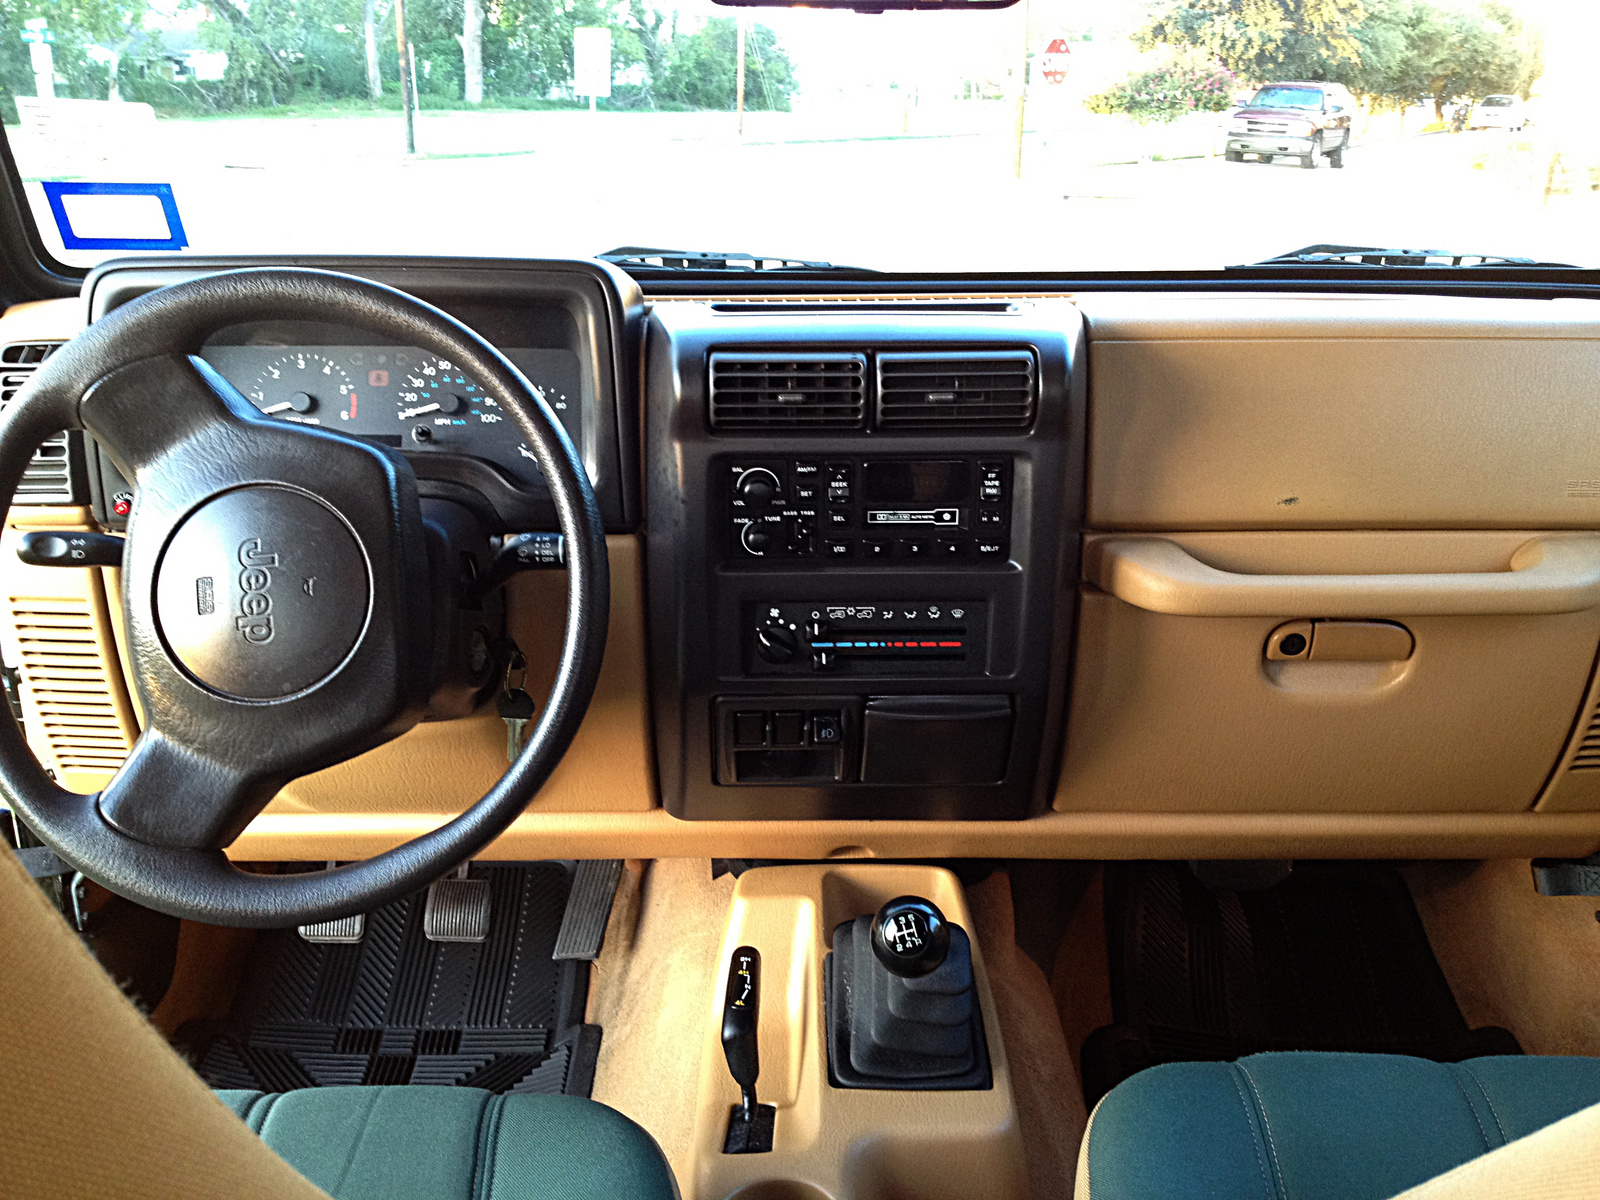 1992 Jeep Wrangler Pictures Cargurus